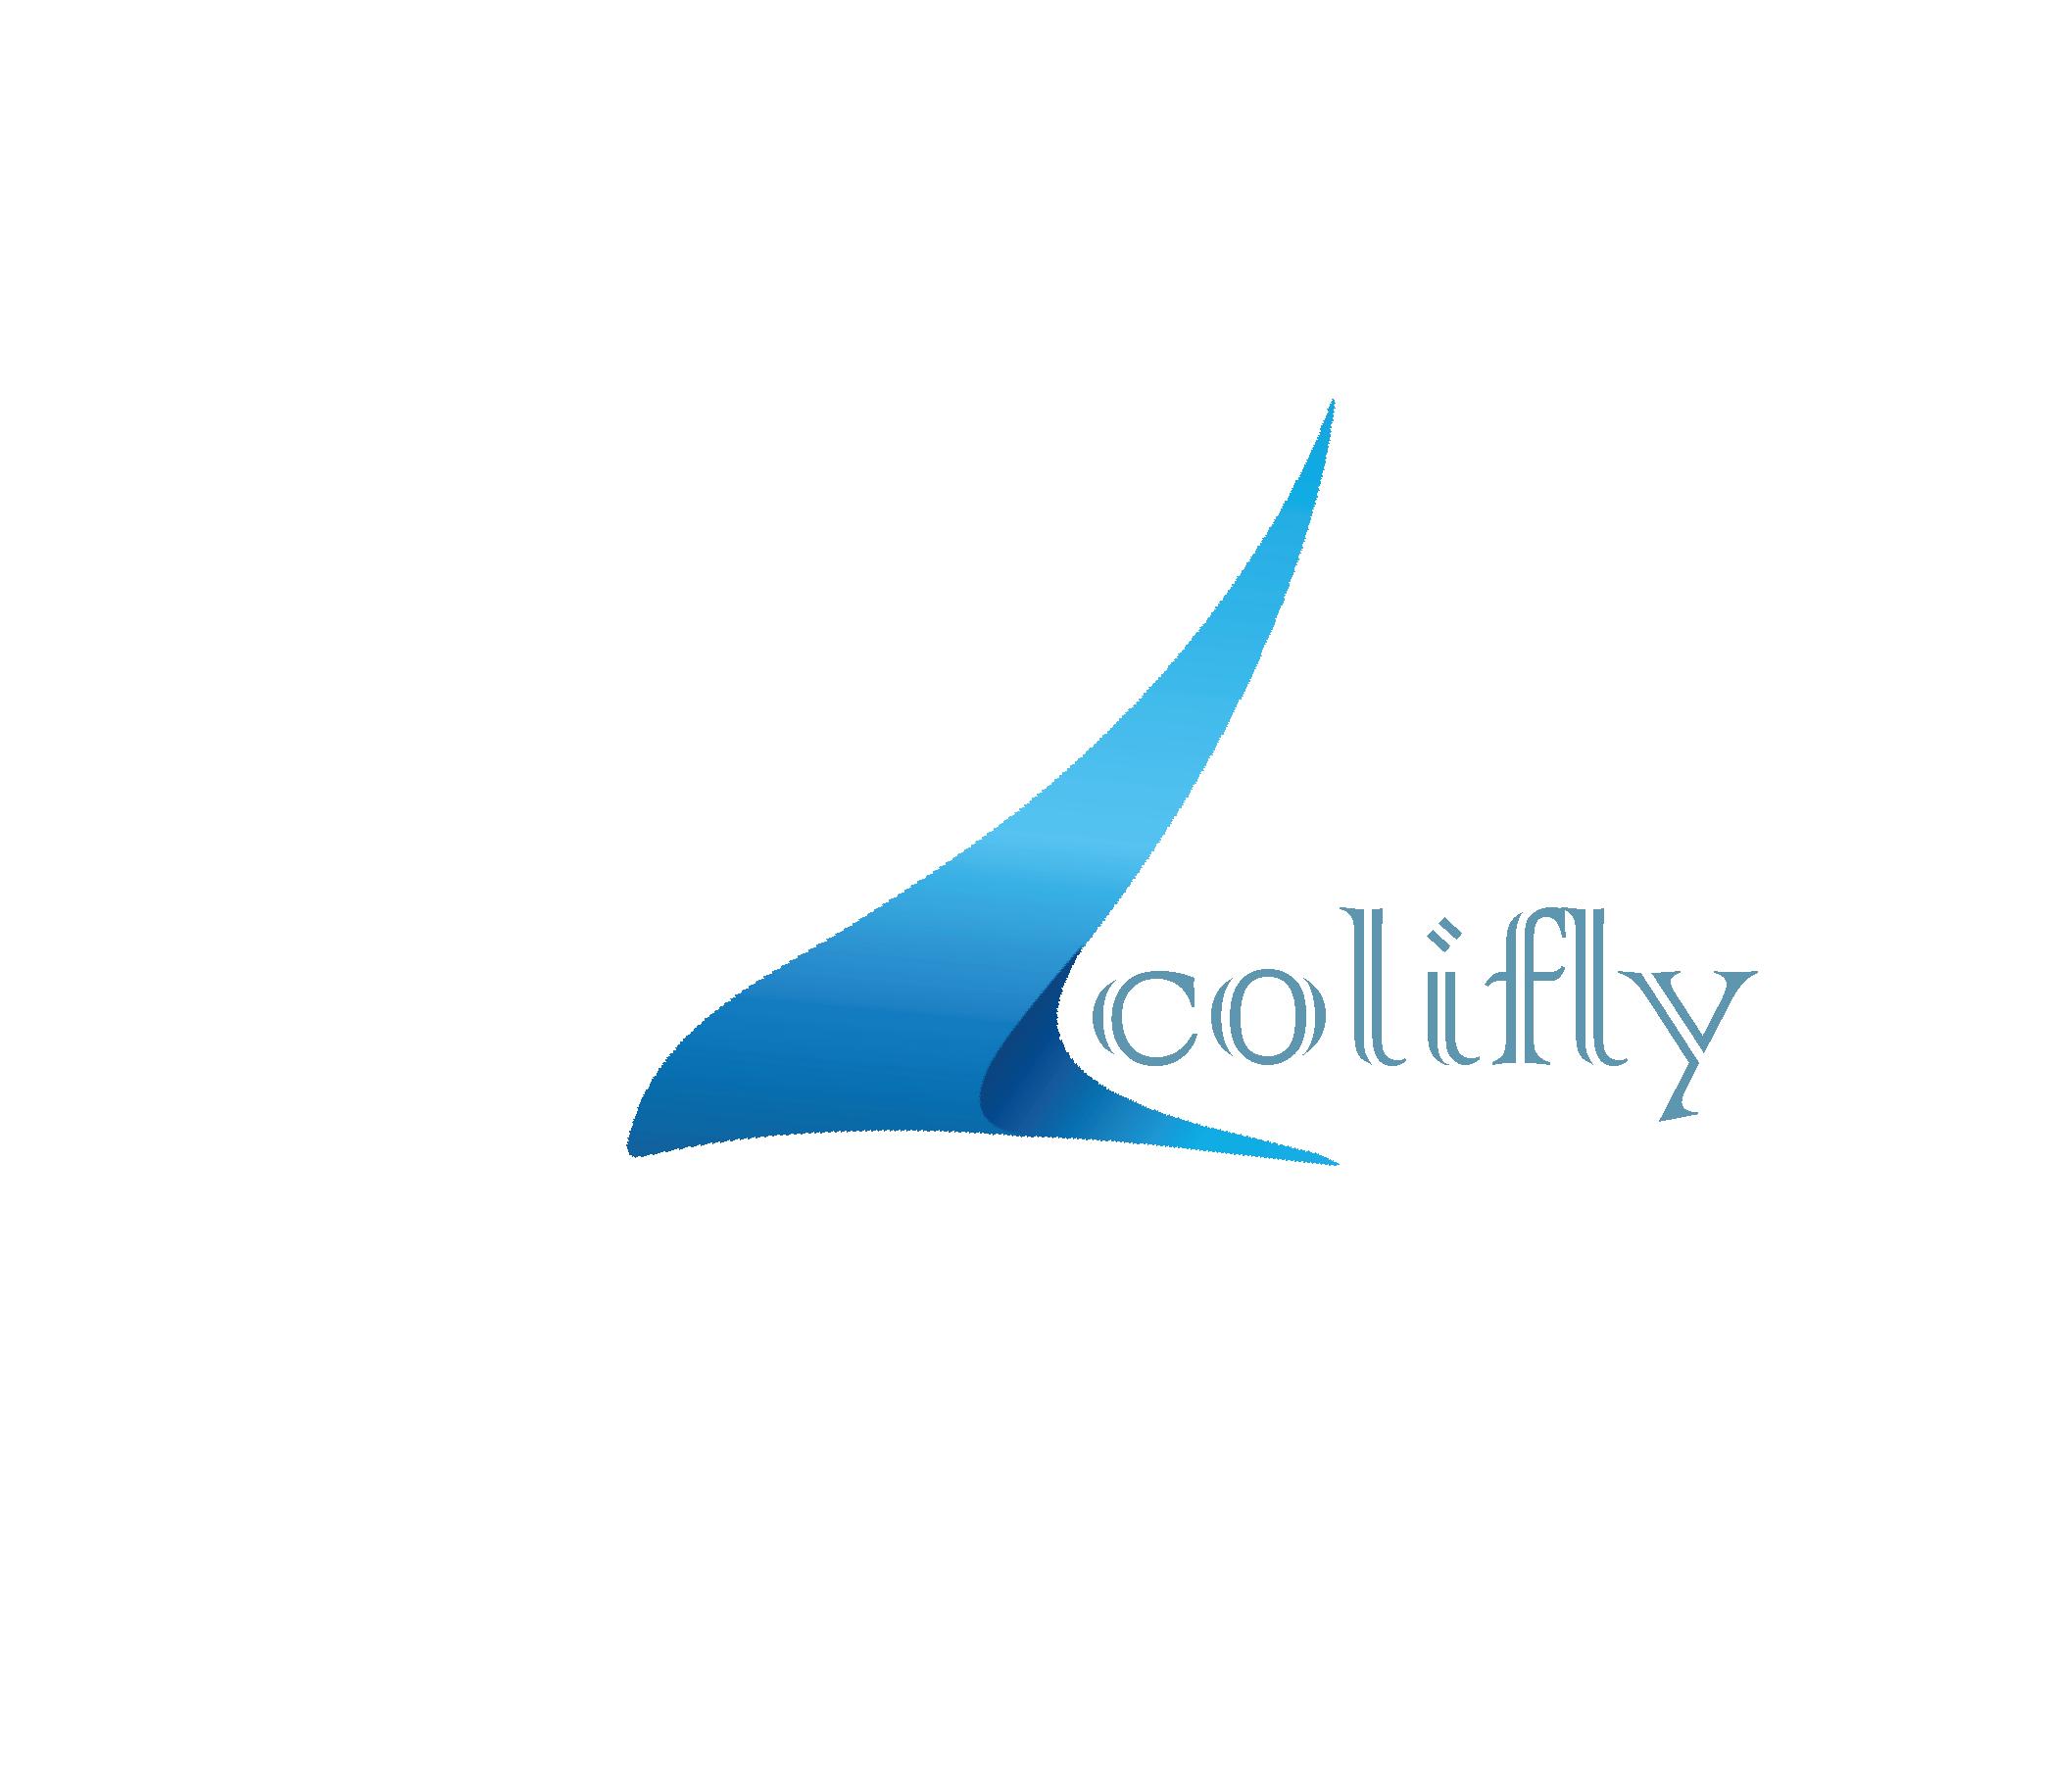 coliflyio